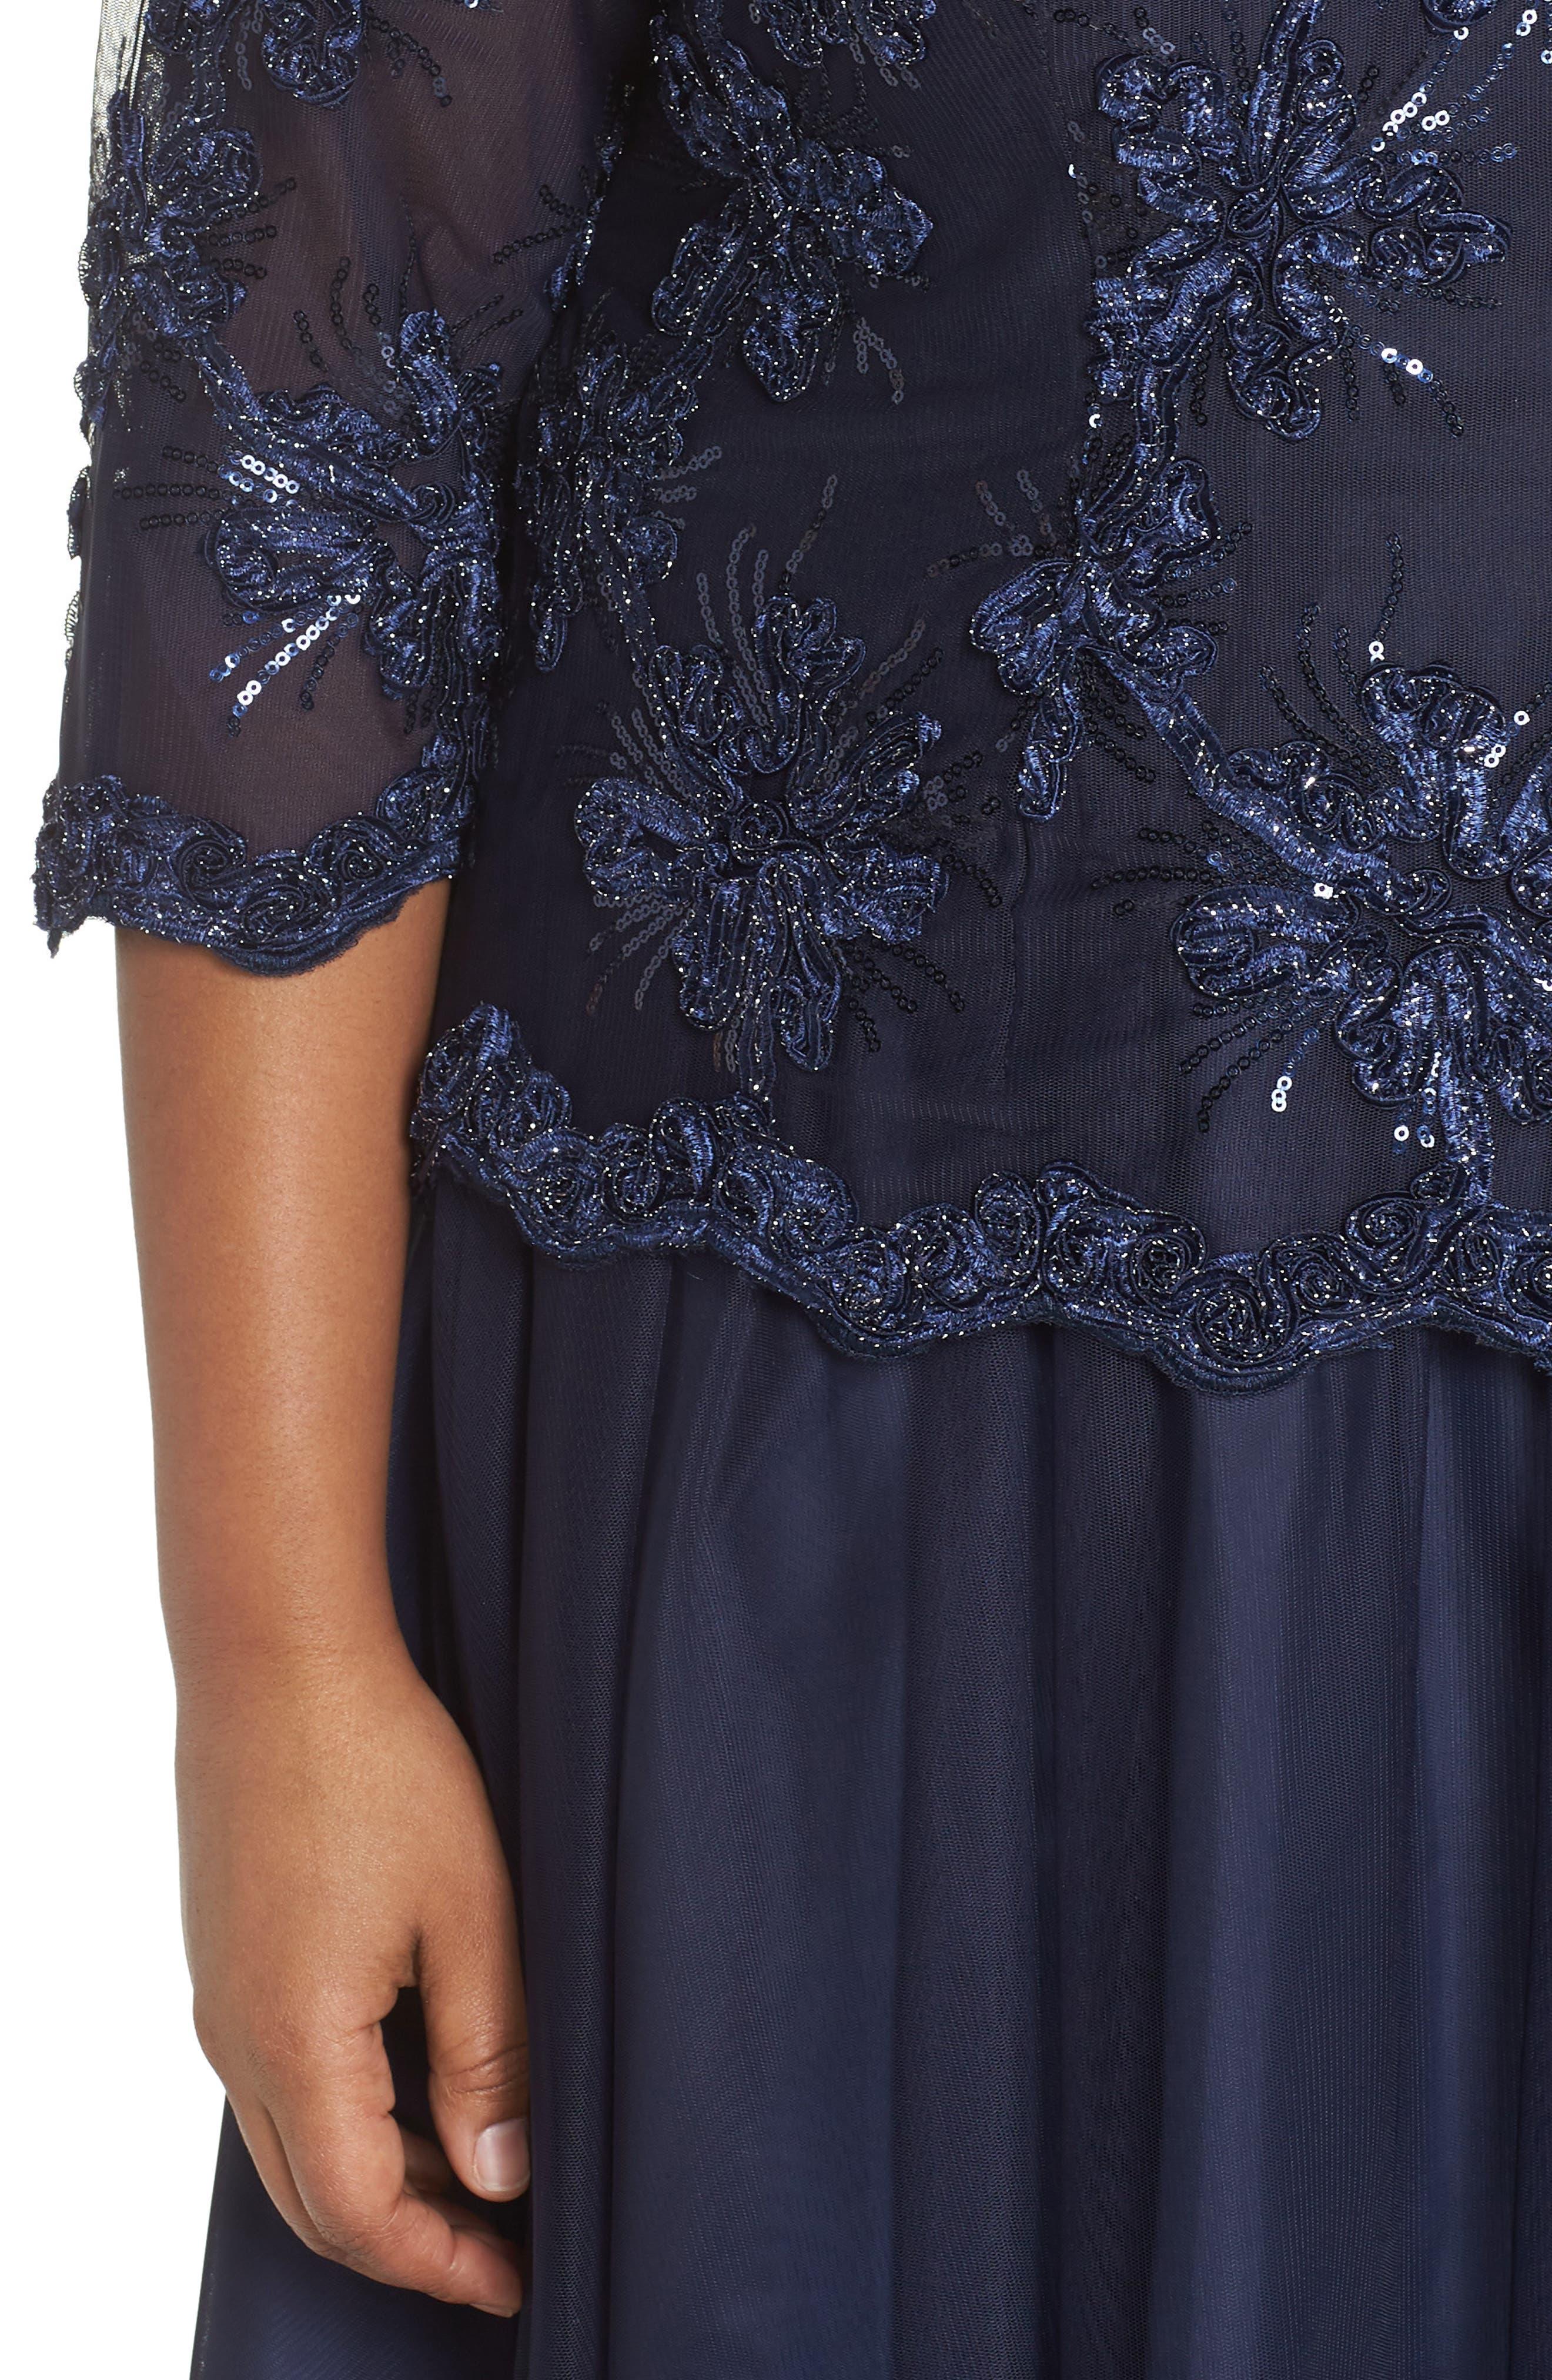 Embellished Bodice Tea Length Mesh Dress,                             Alternate thumbnail 4, color,                             Navy